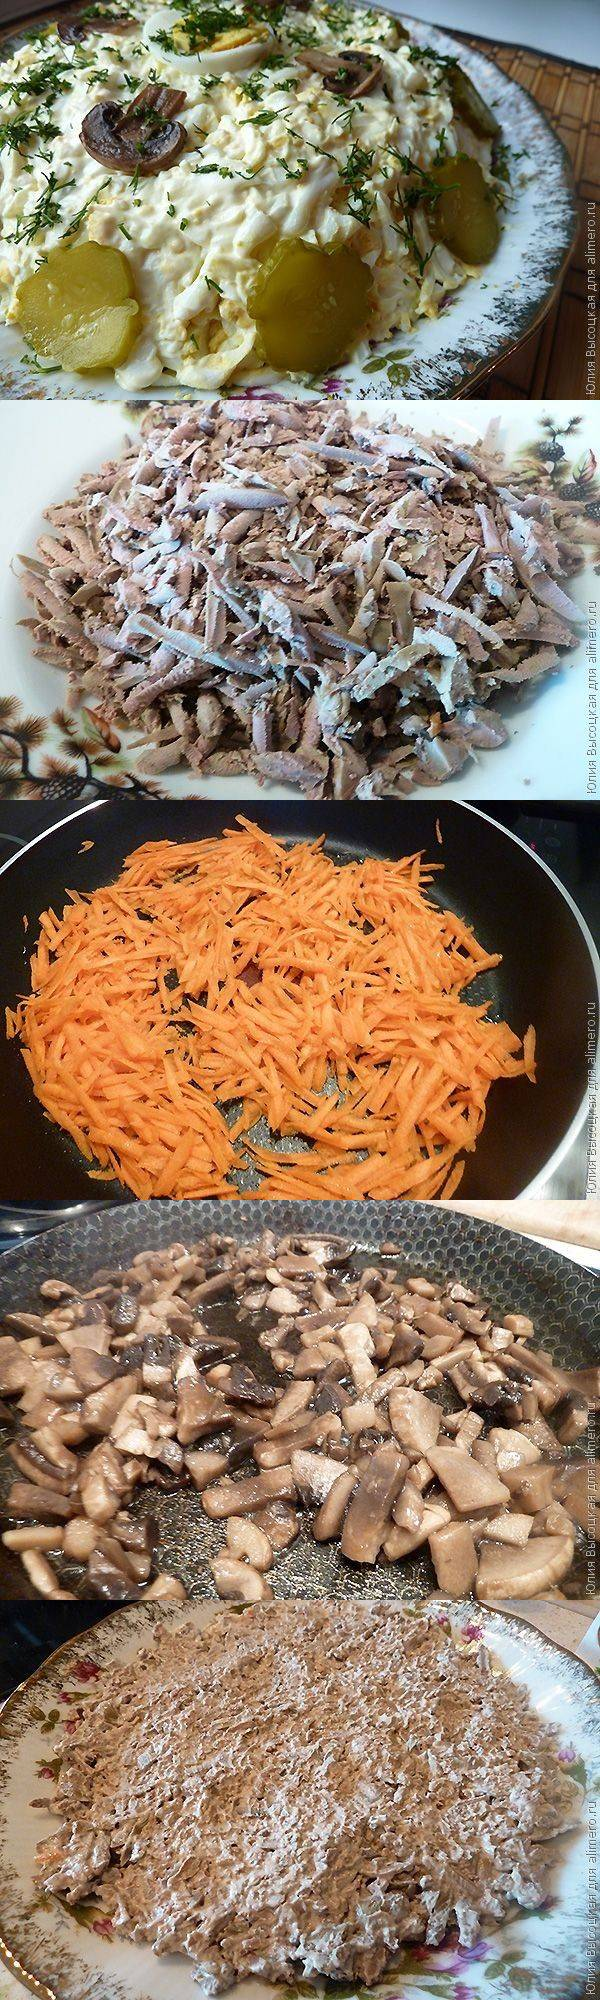 Печенка в майонезе рецепт пошагово на сковороде